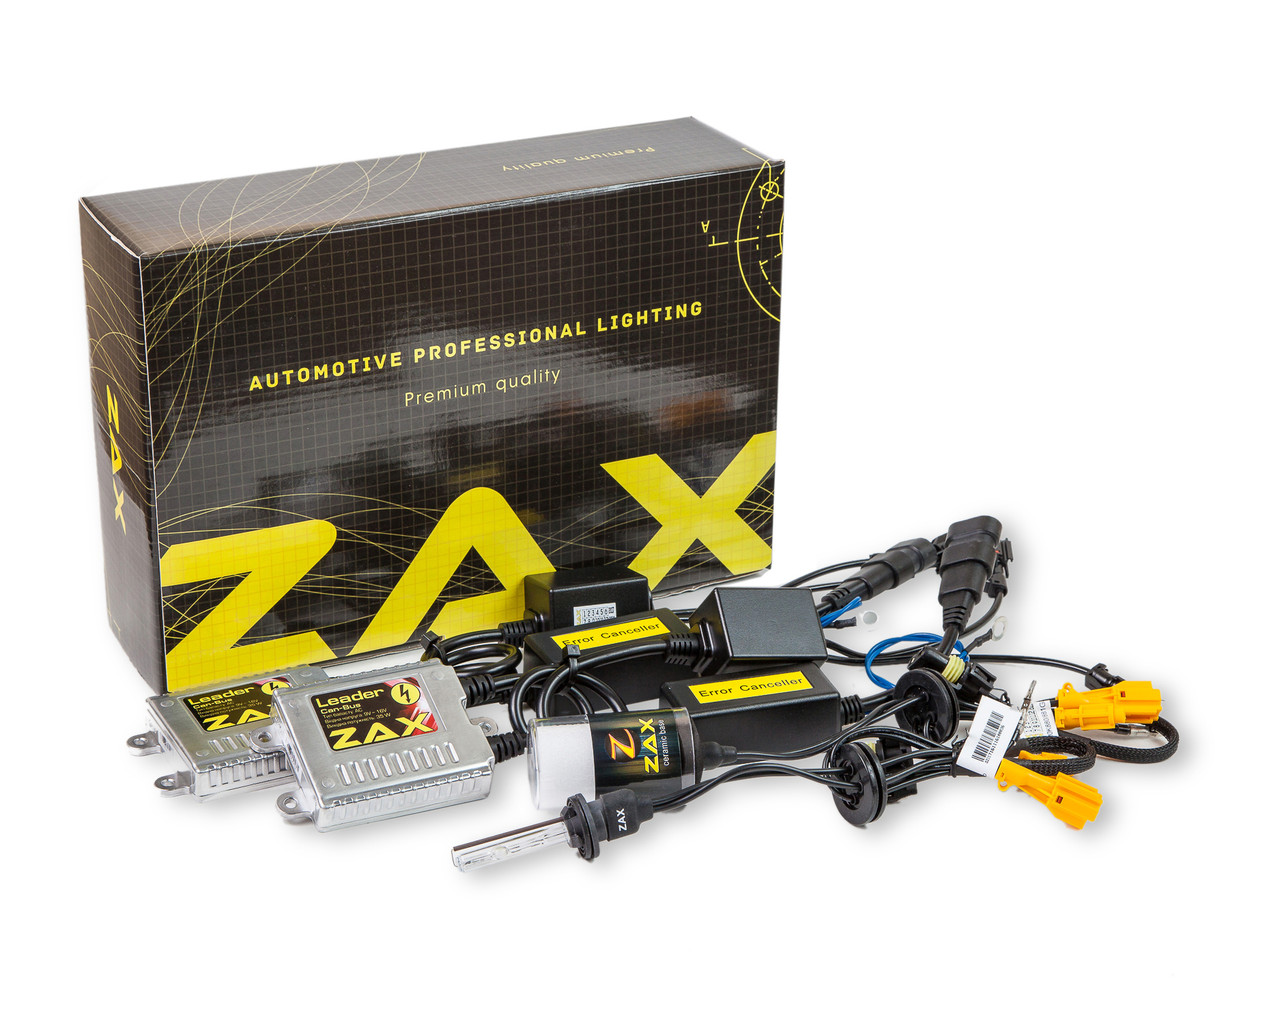 Комплект ксенона ZAX Leader Can-Bus 35W 9-16V H27 (880/881) Ceramic 6000K